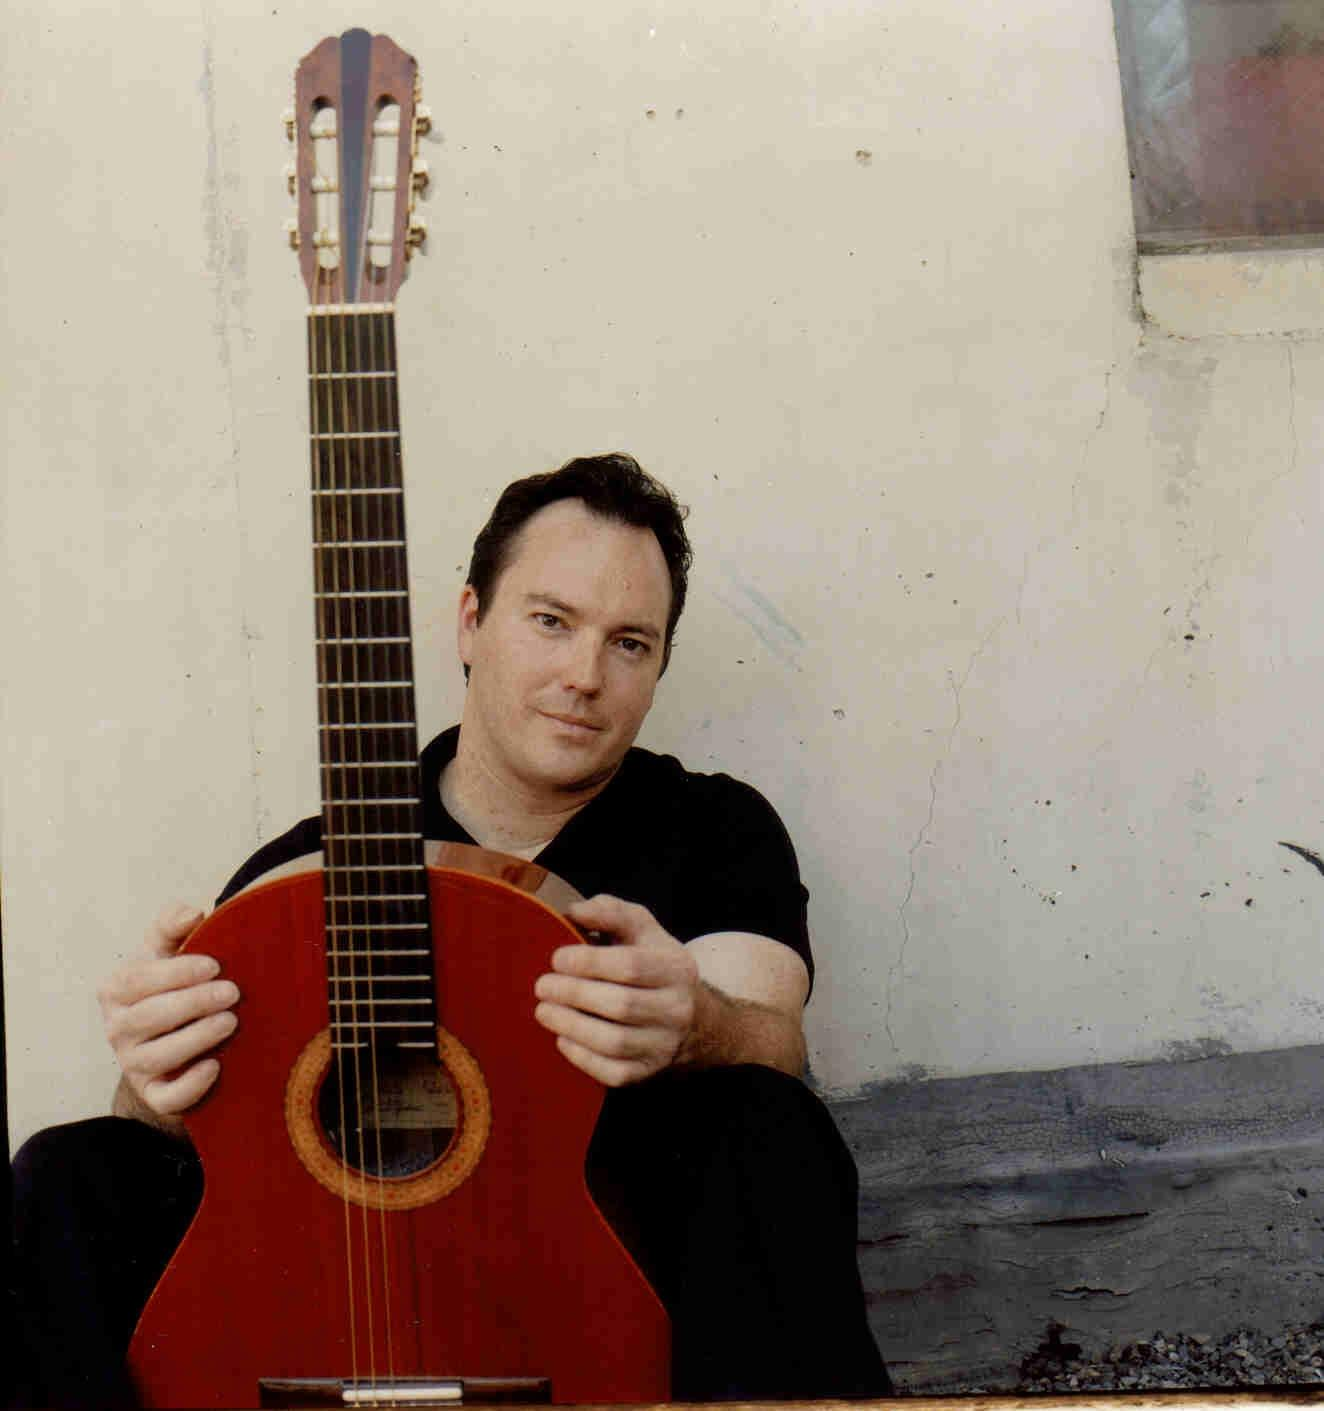 MG music publicity photos 016 - Guitarist